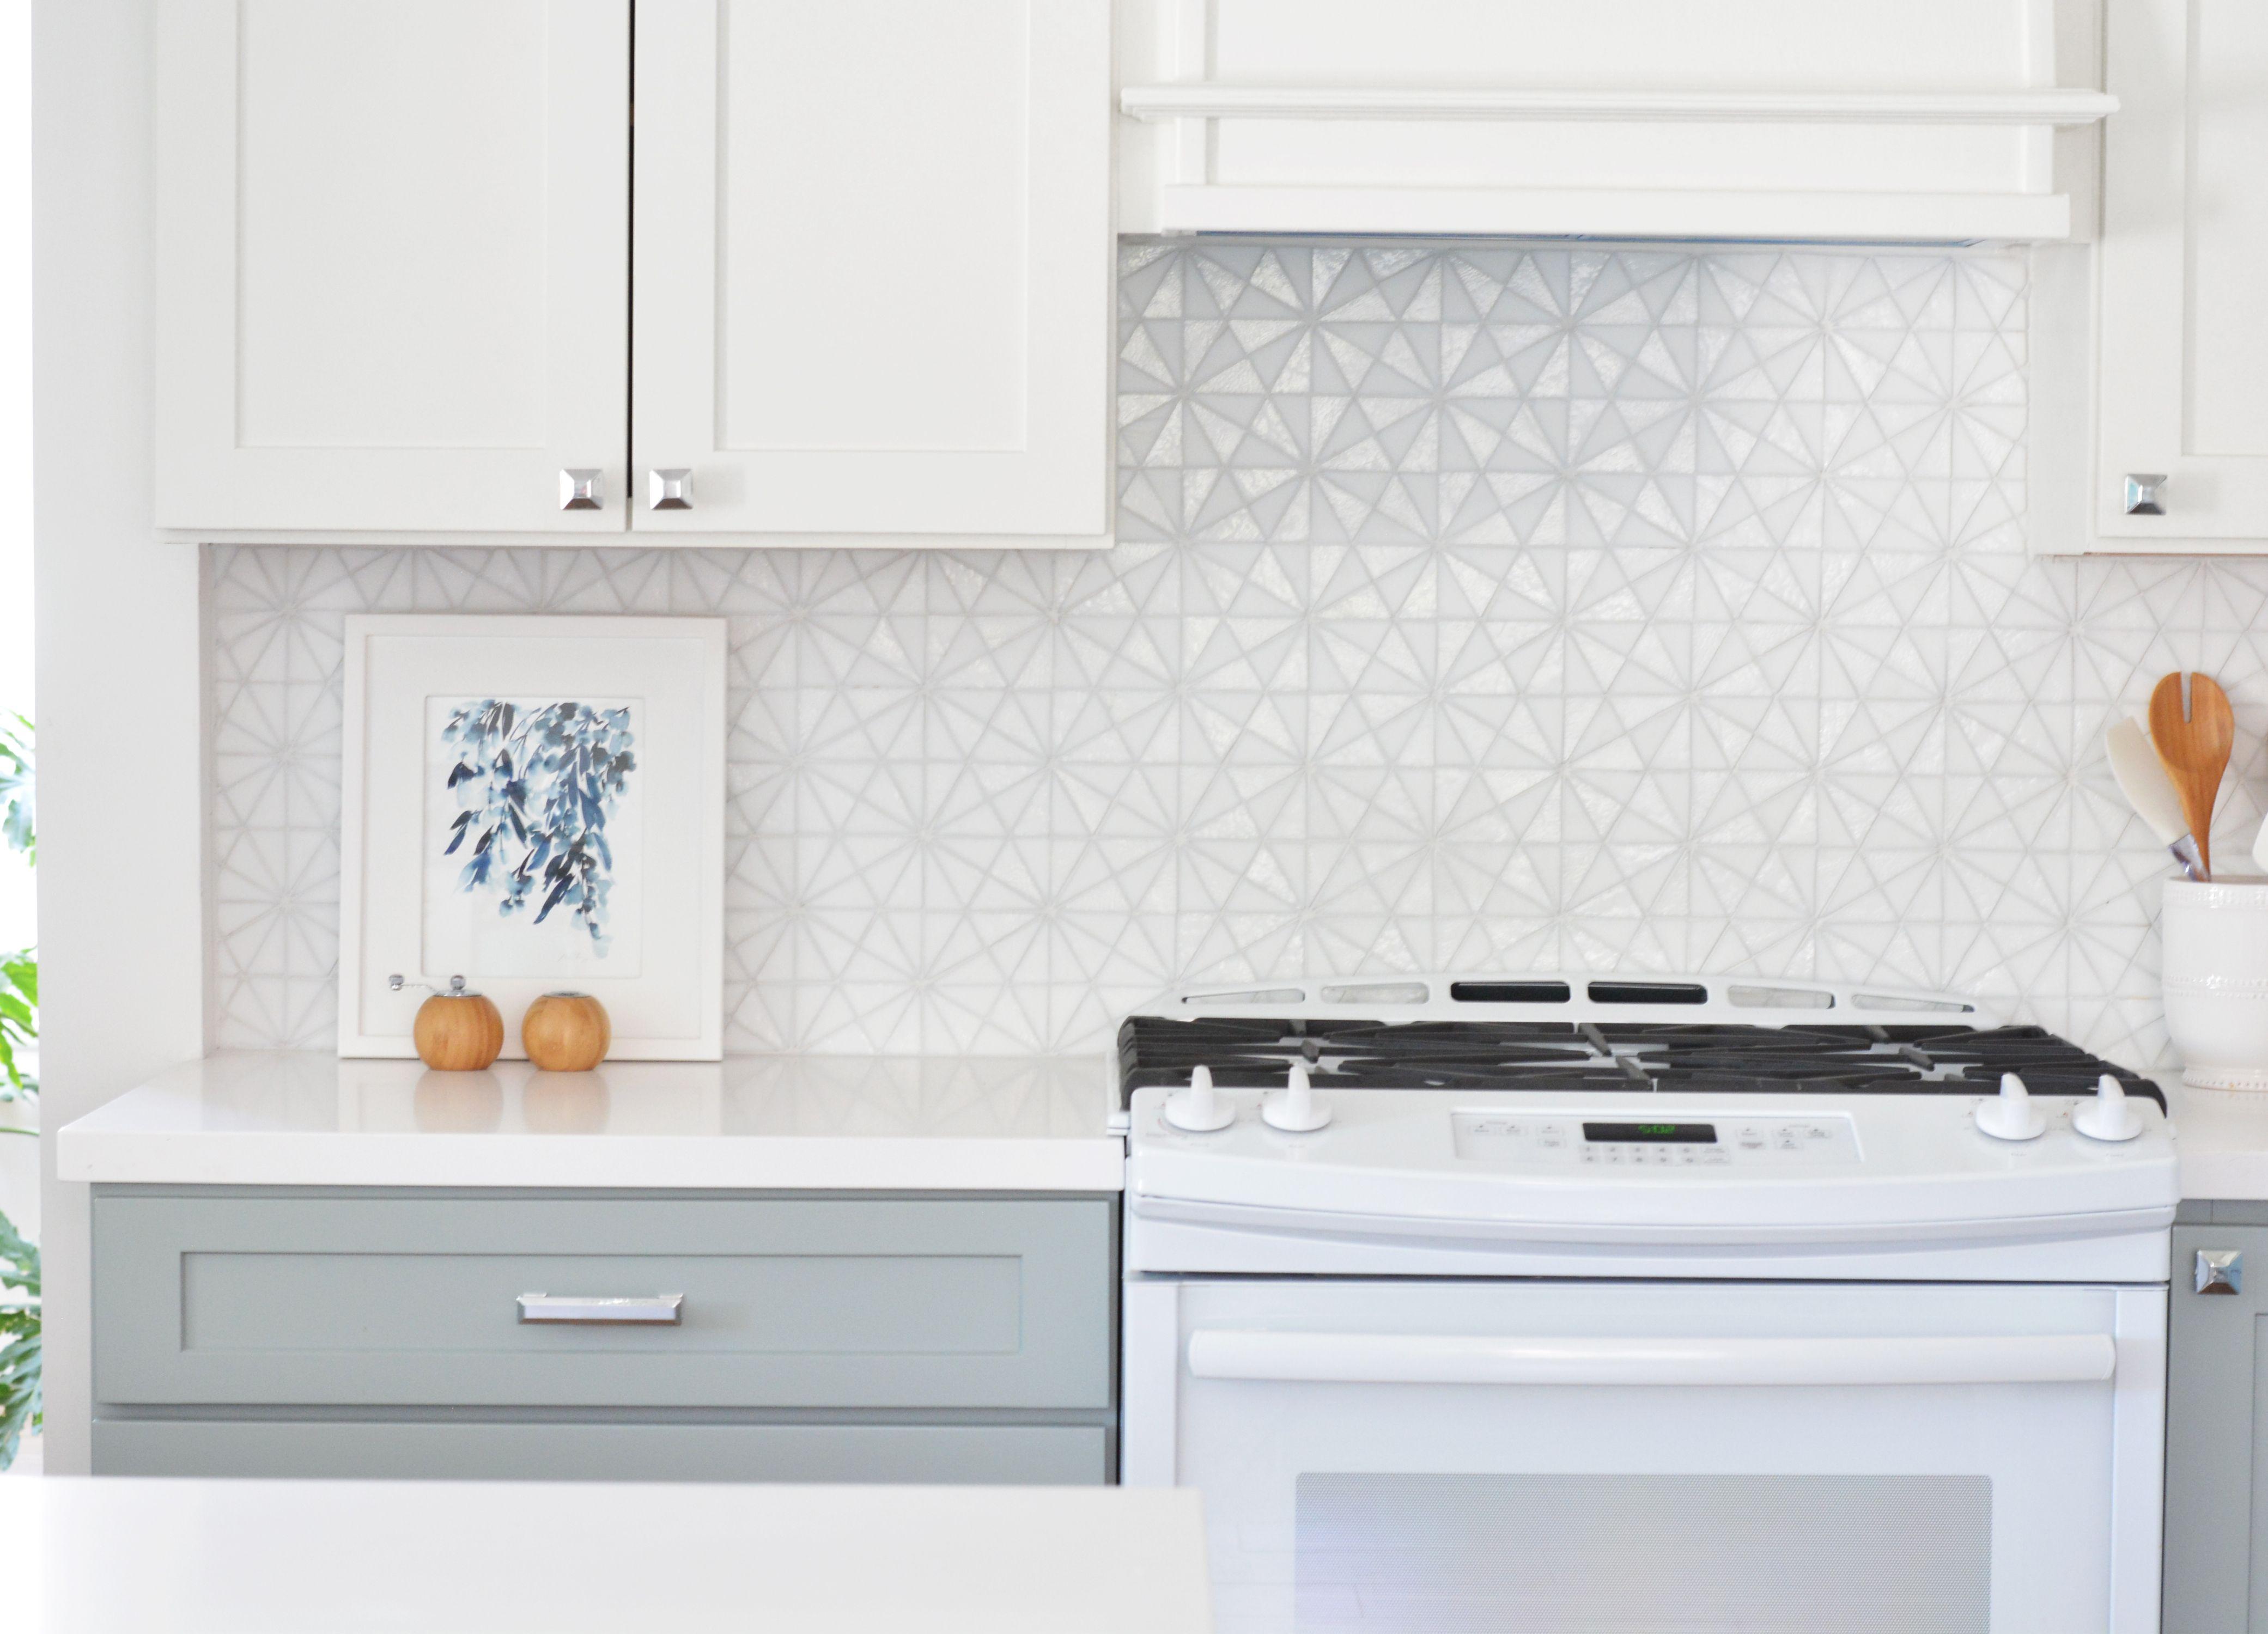 Kitchen girl hd girls kitchen patterned backsplash tile kitchen ideas